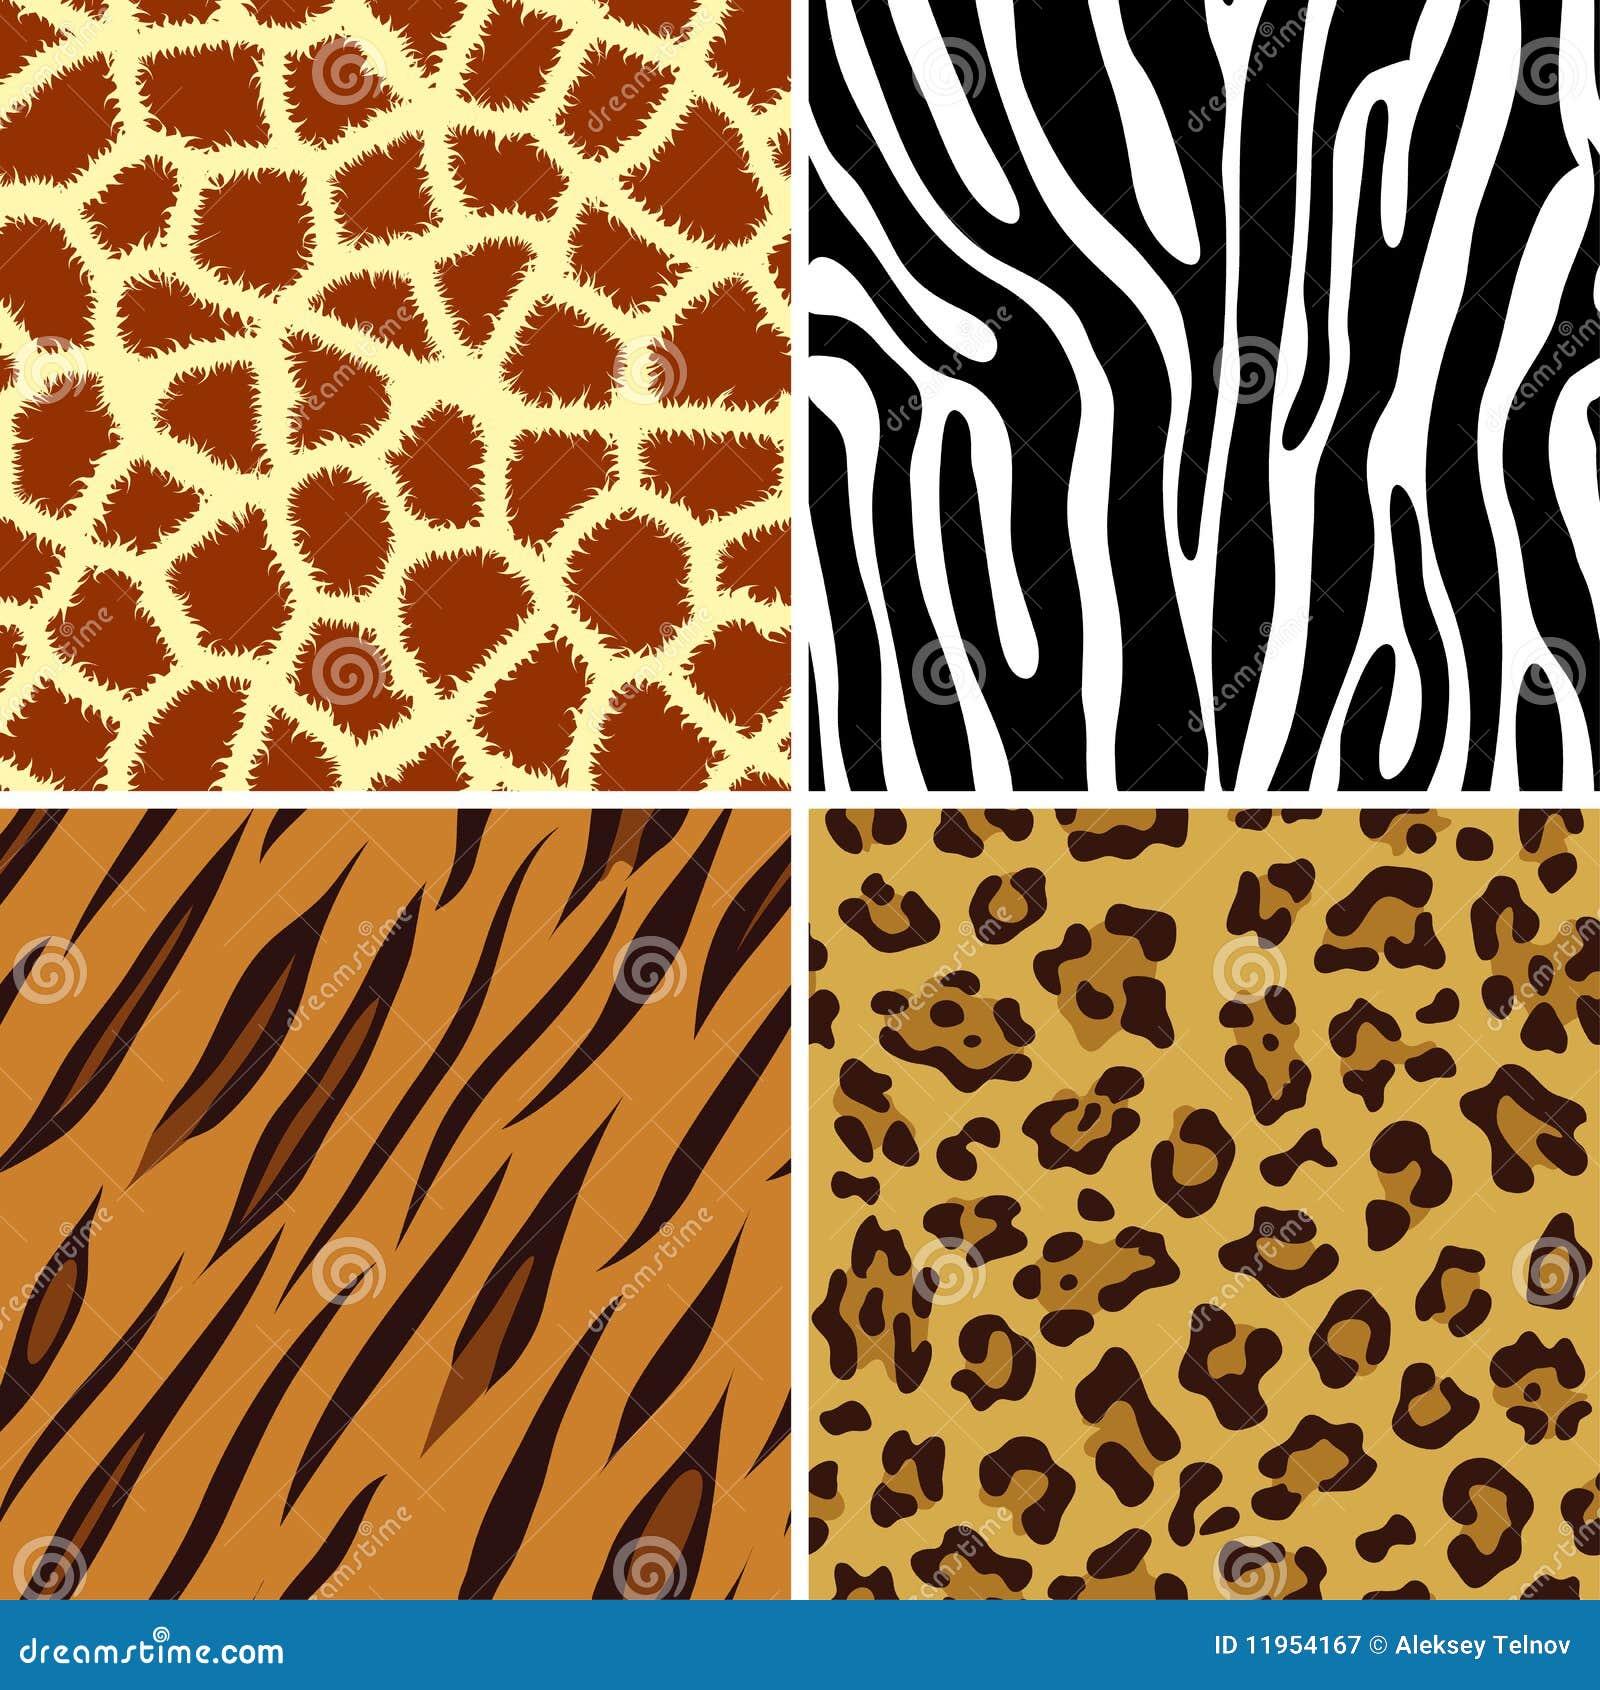 Seamless animal print stock vector. Illustration of iteration - 11954167